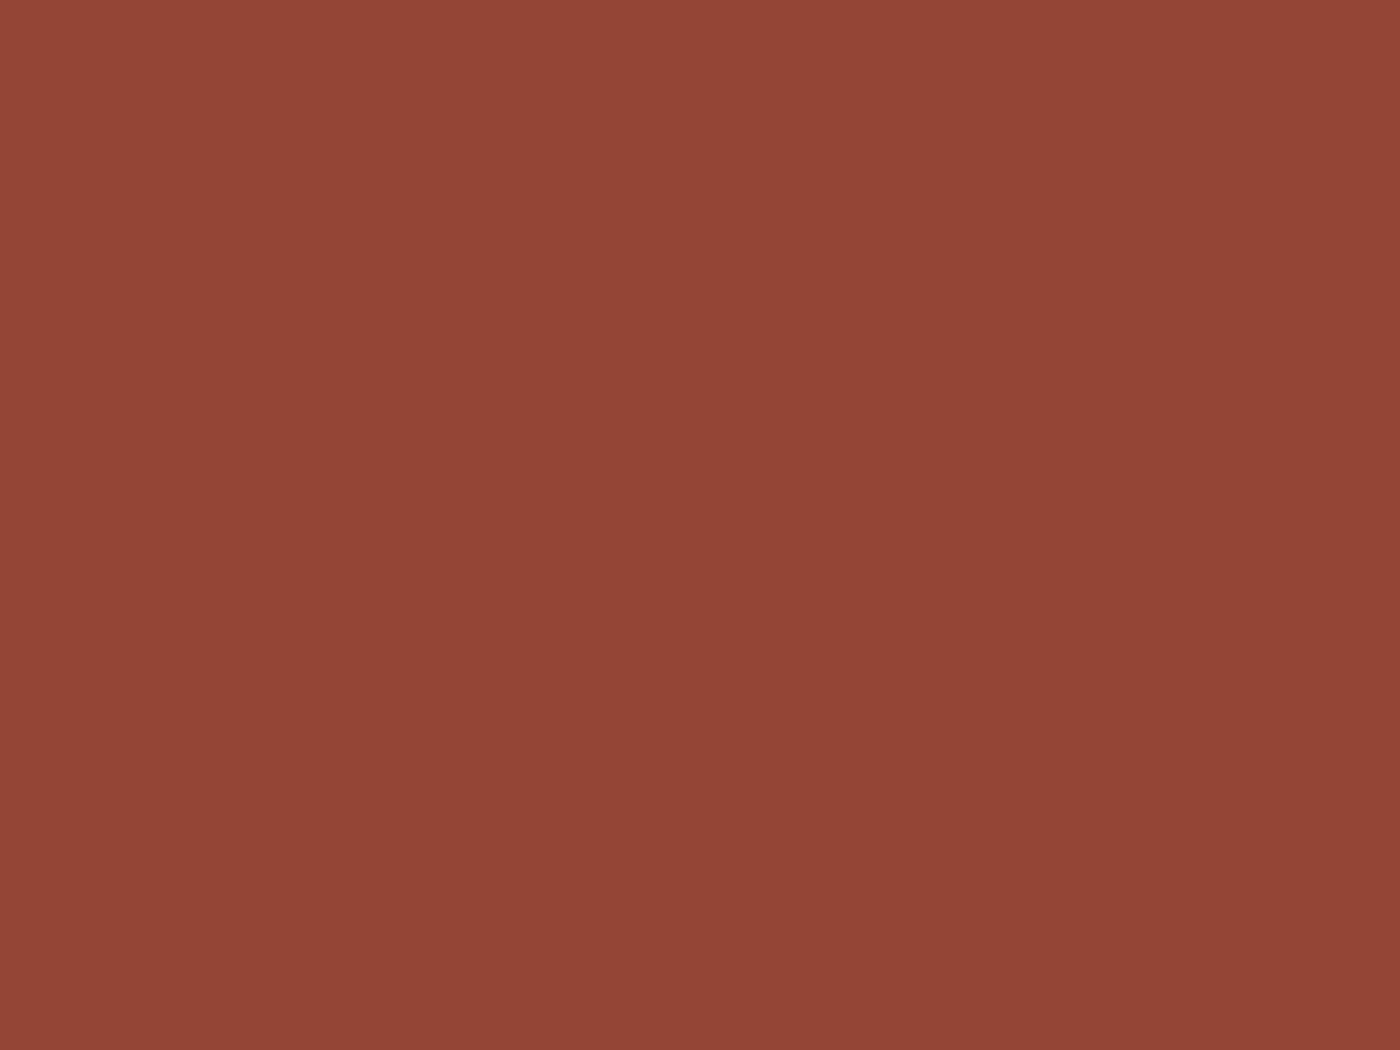 1400x1050 Chestnut Solid Color Background